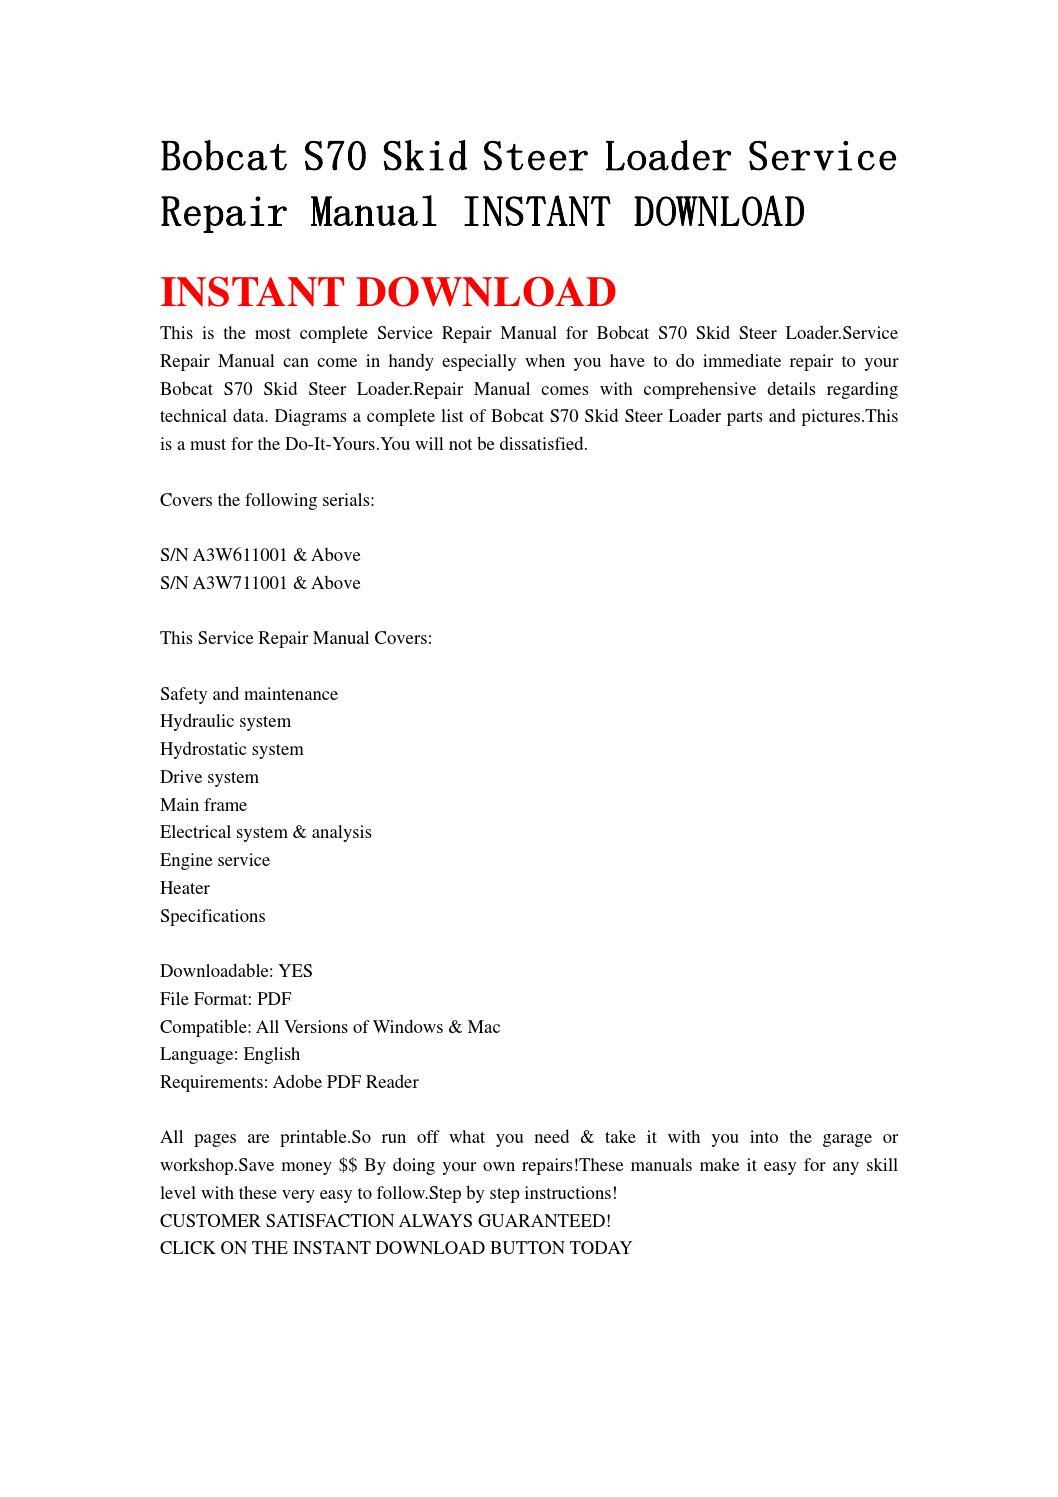 Bobcat s70 skid steer loader service repair manual instant download by  fjhsegfnnse - issuu